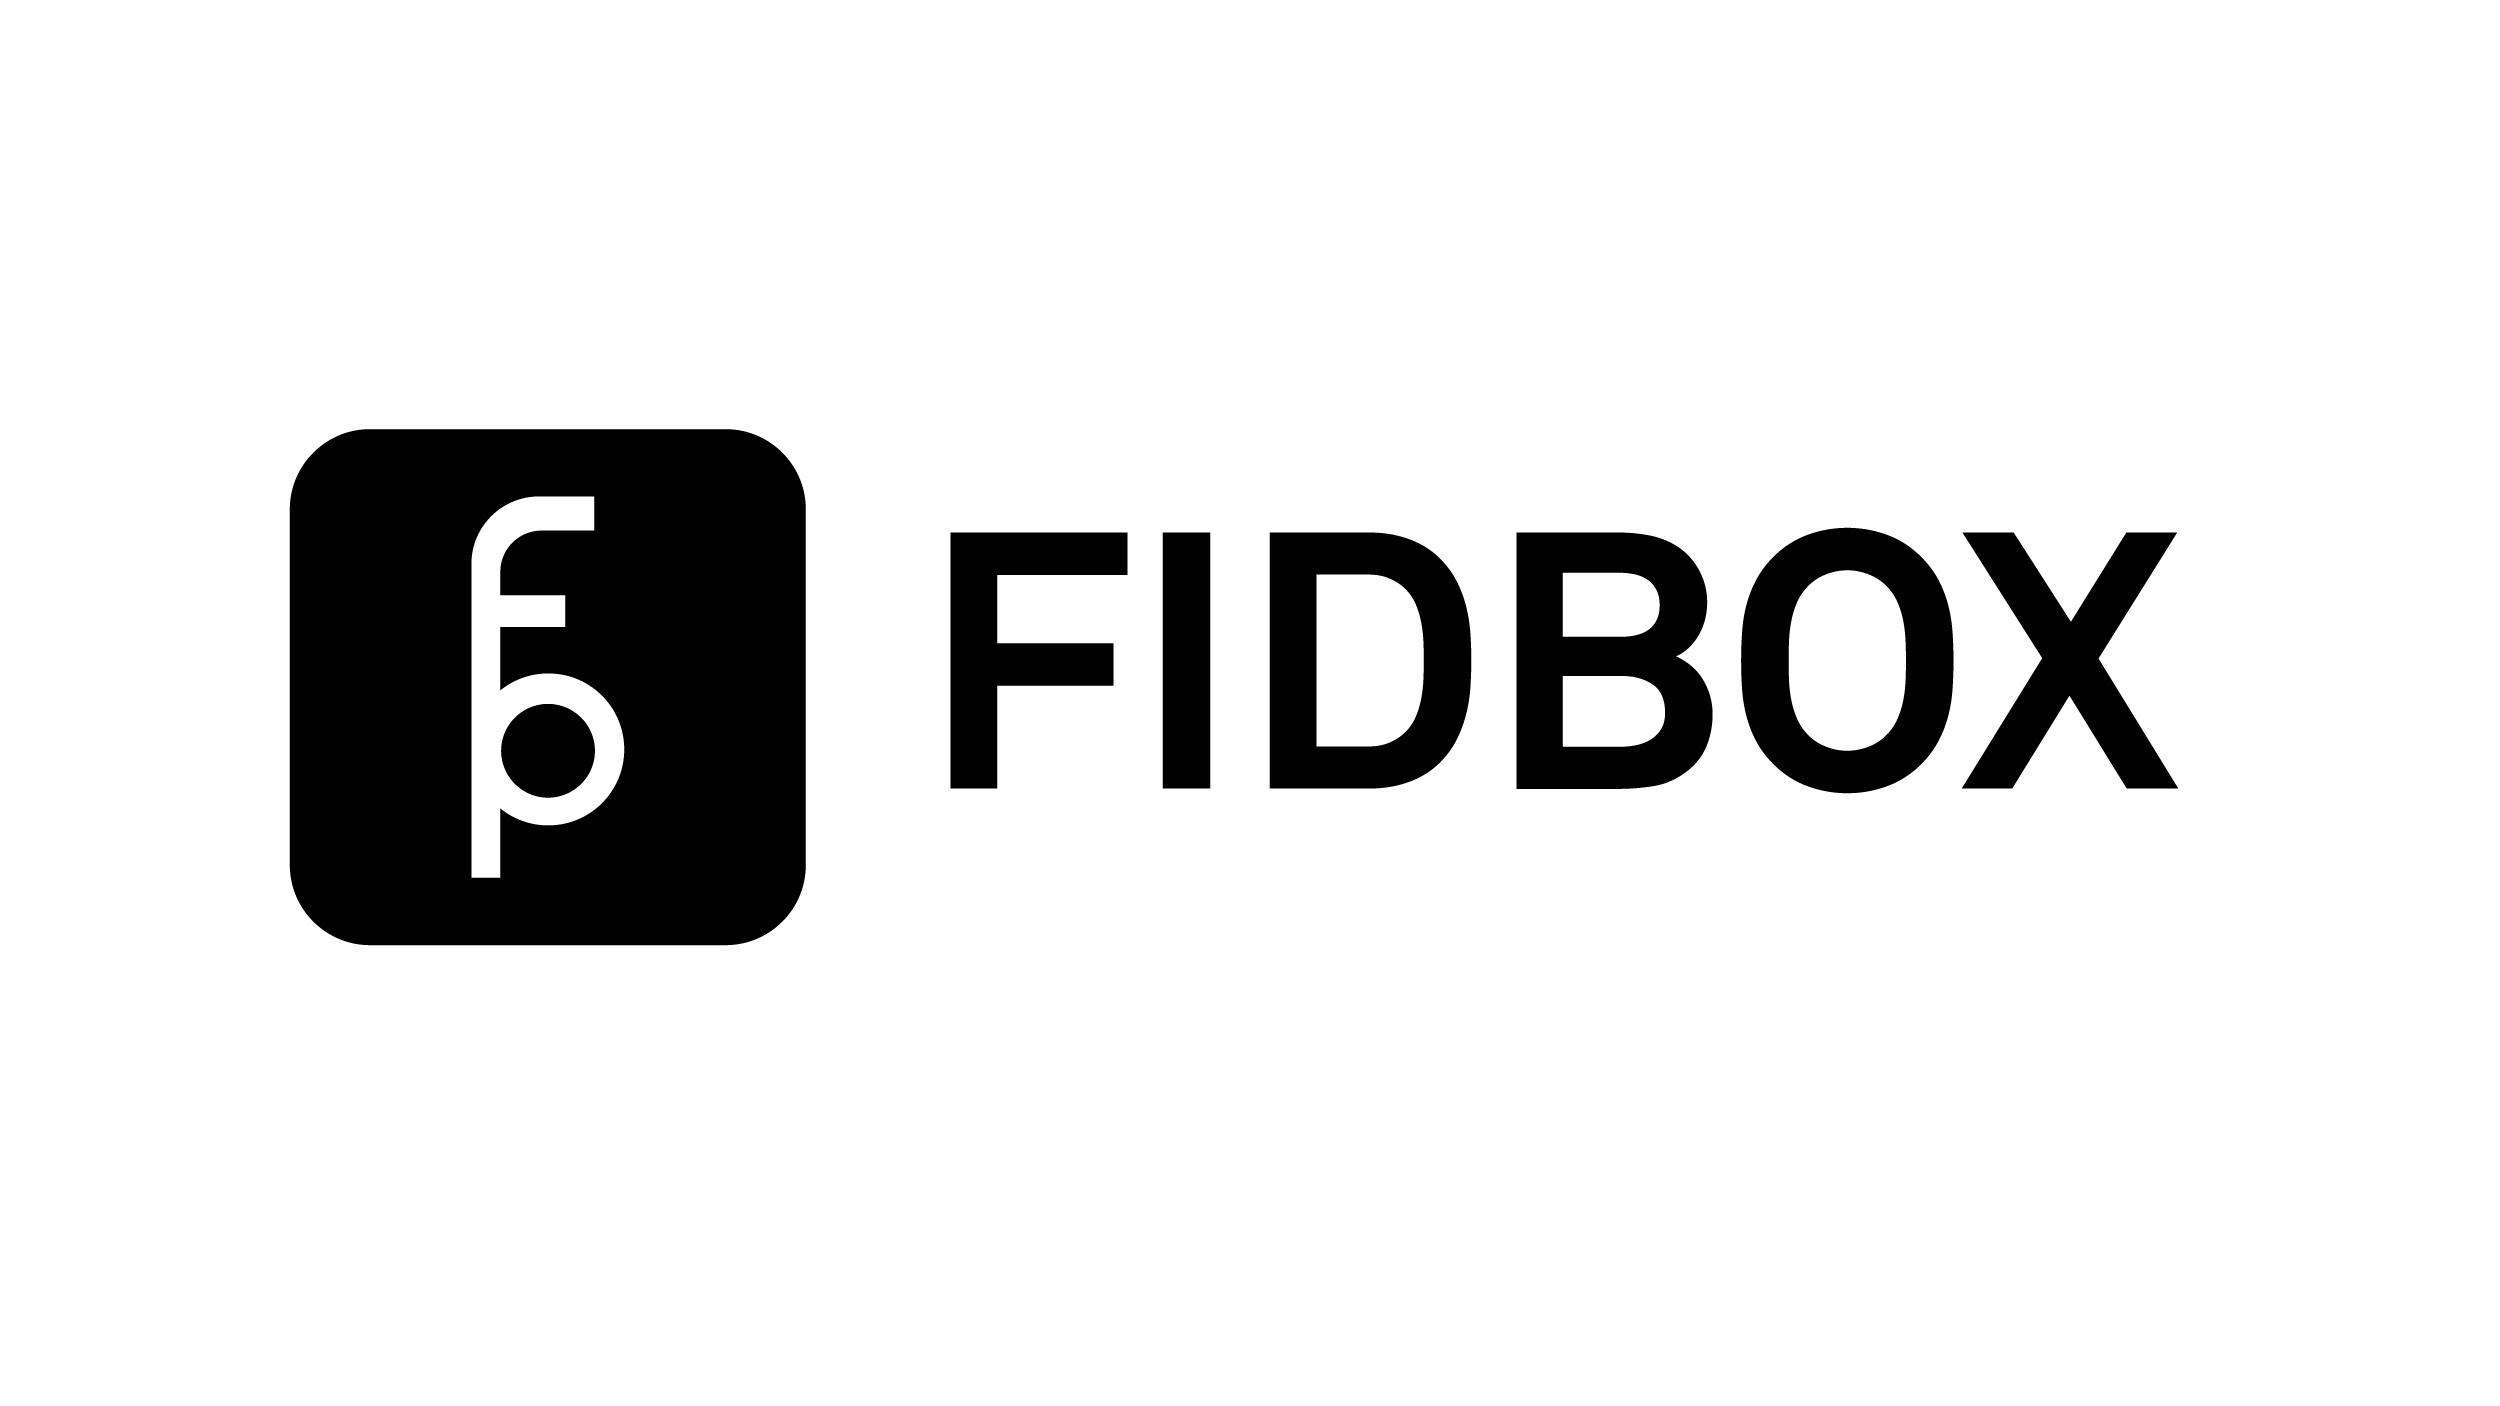 fidbox-logo.jpg